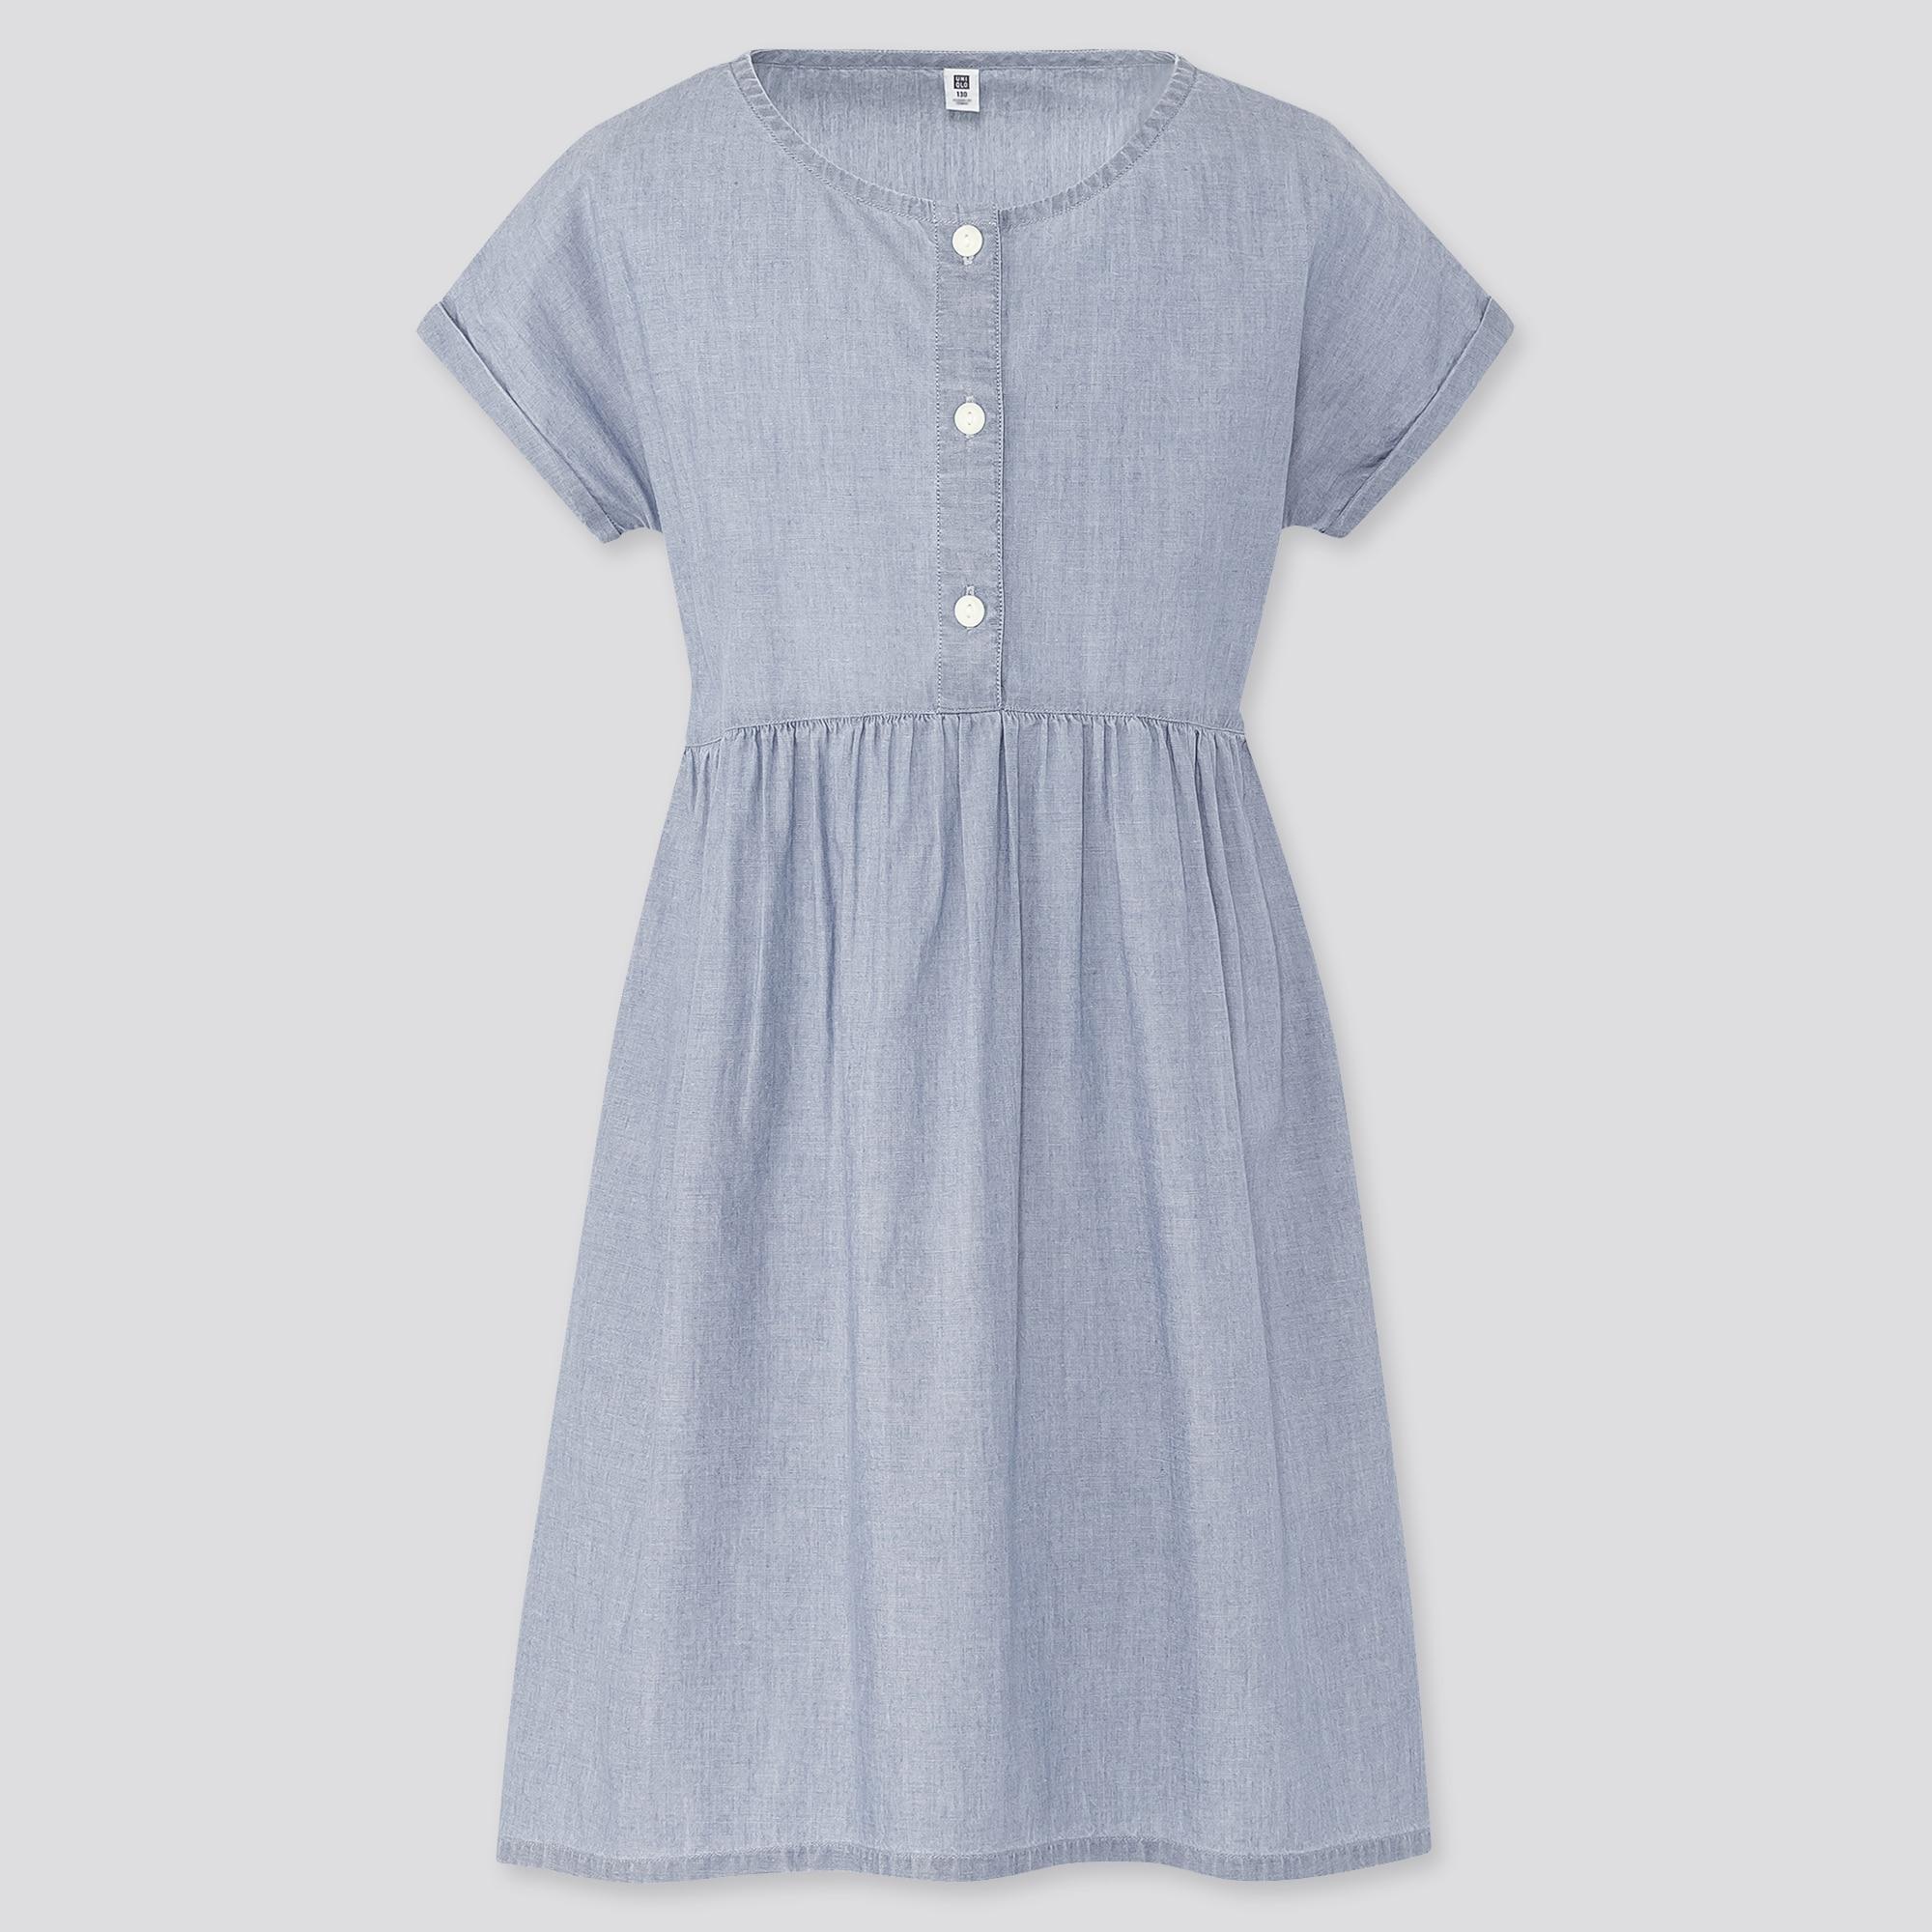 GIRLS CHAMBRAY SHORT-SLEEVE DRESS